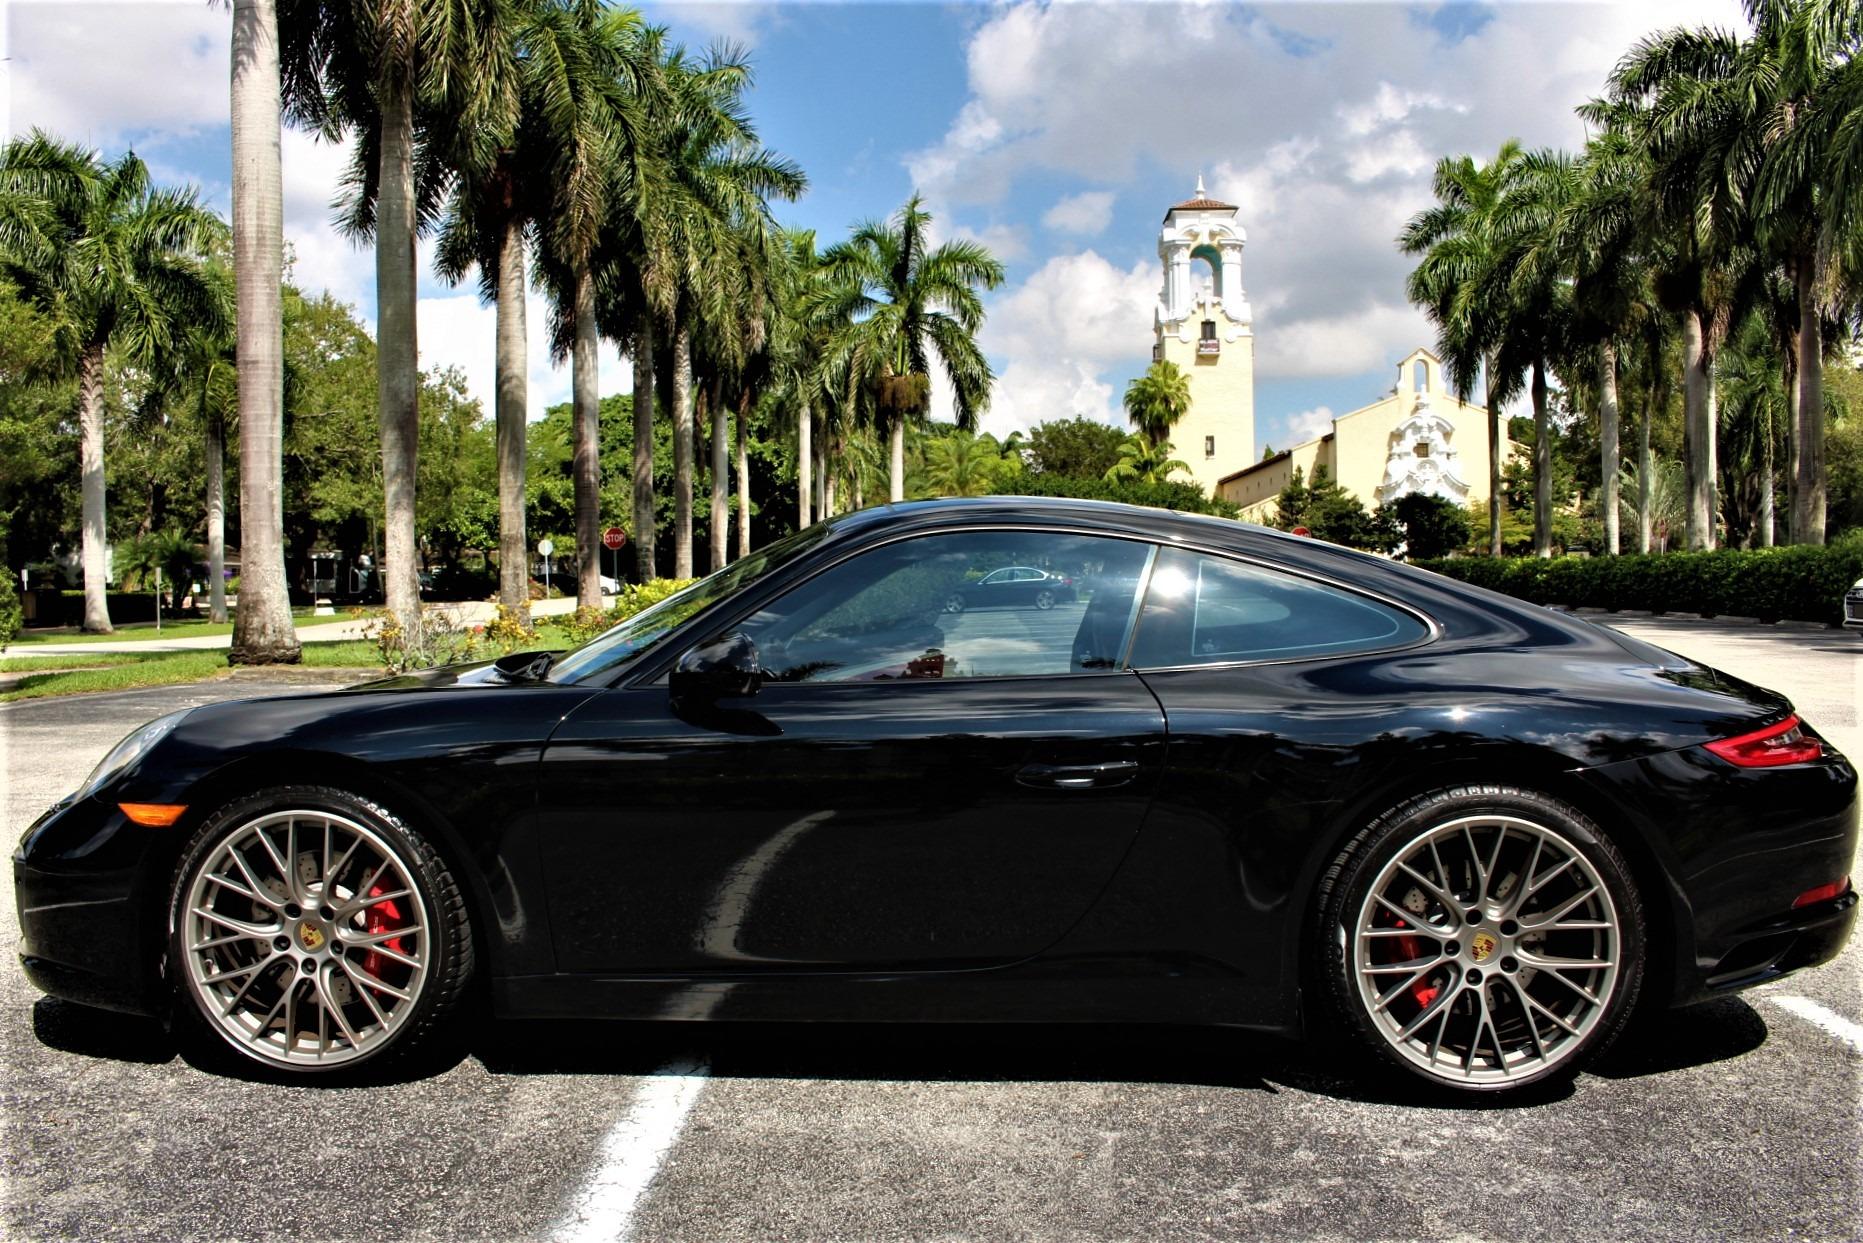 Used 2017 Porsche 911 Carrera S for sale $81,850 at The Gables Sports Cars in Miami FL 33146 4